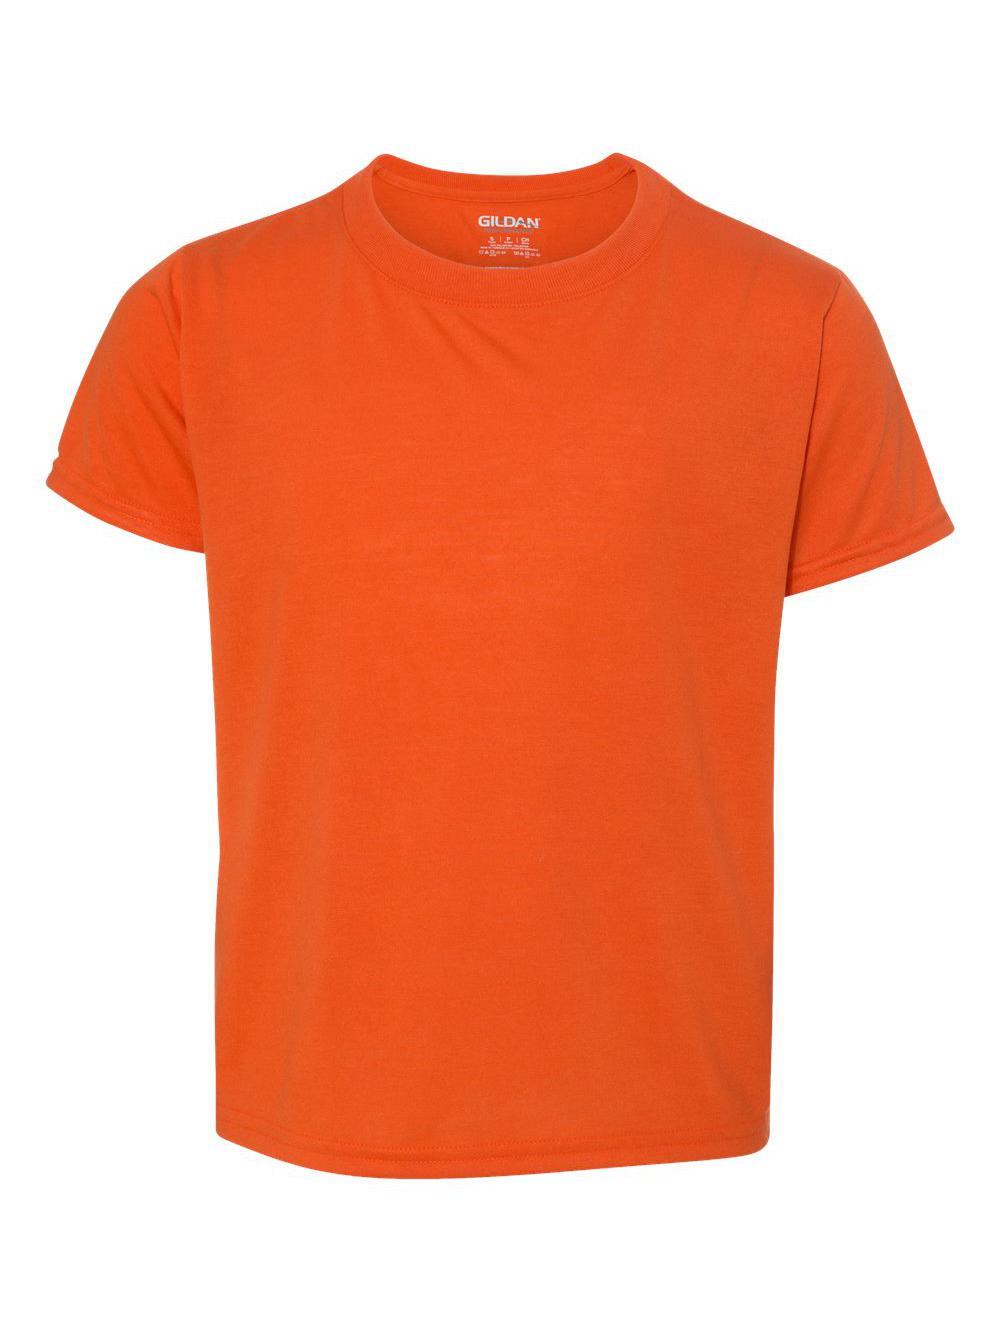 Gildan-Performance-Youth-T-Shirt-42000B thumbnail 12